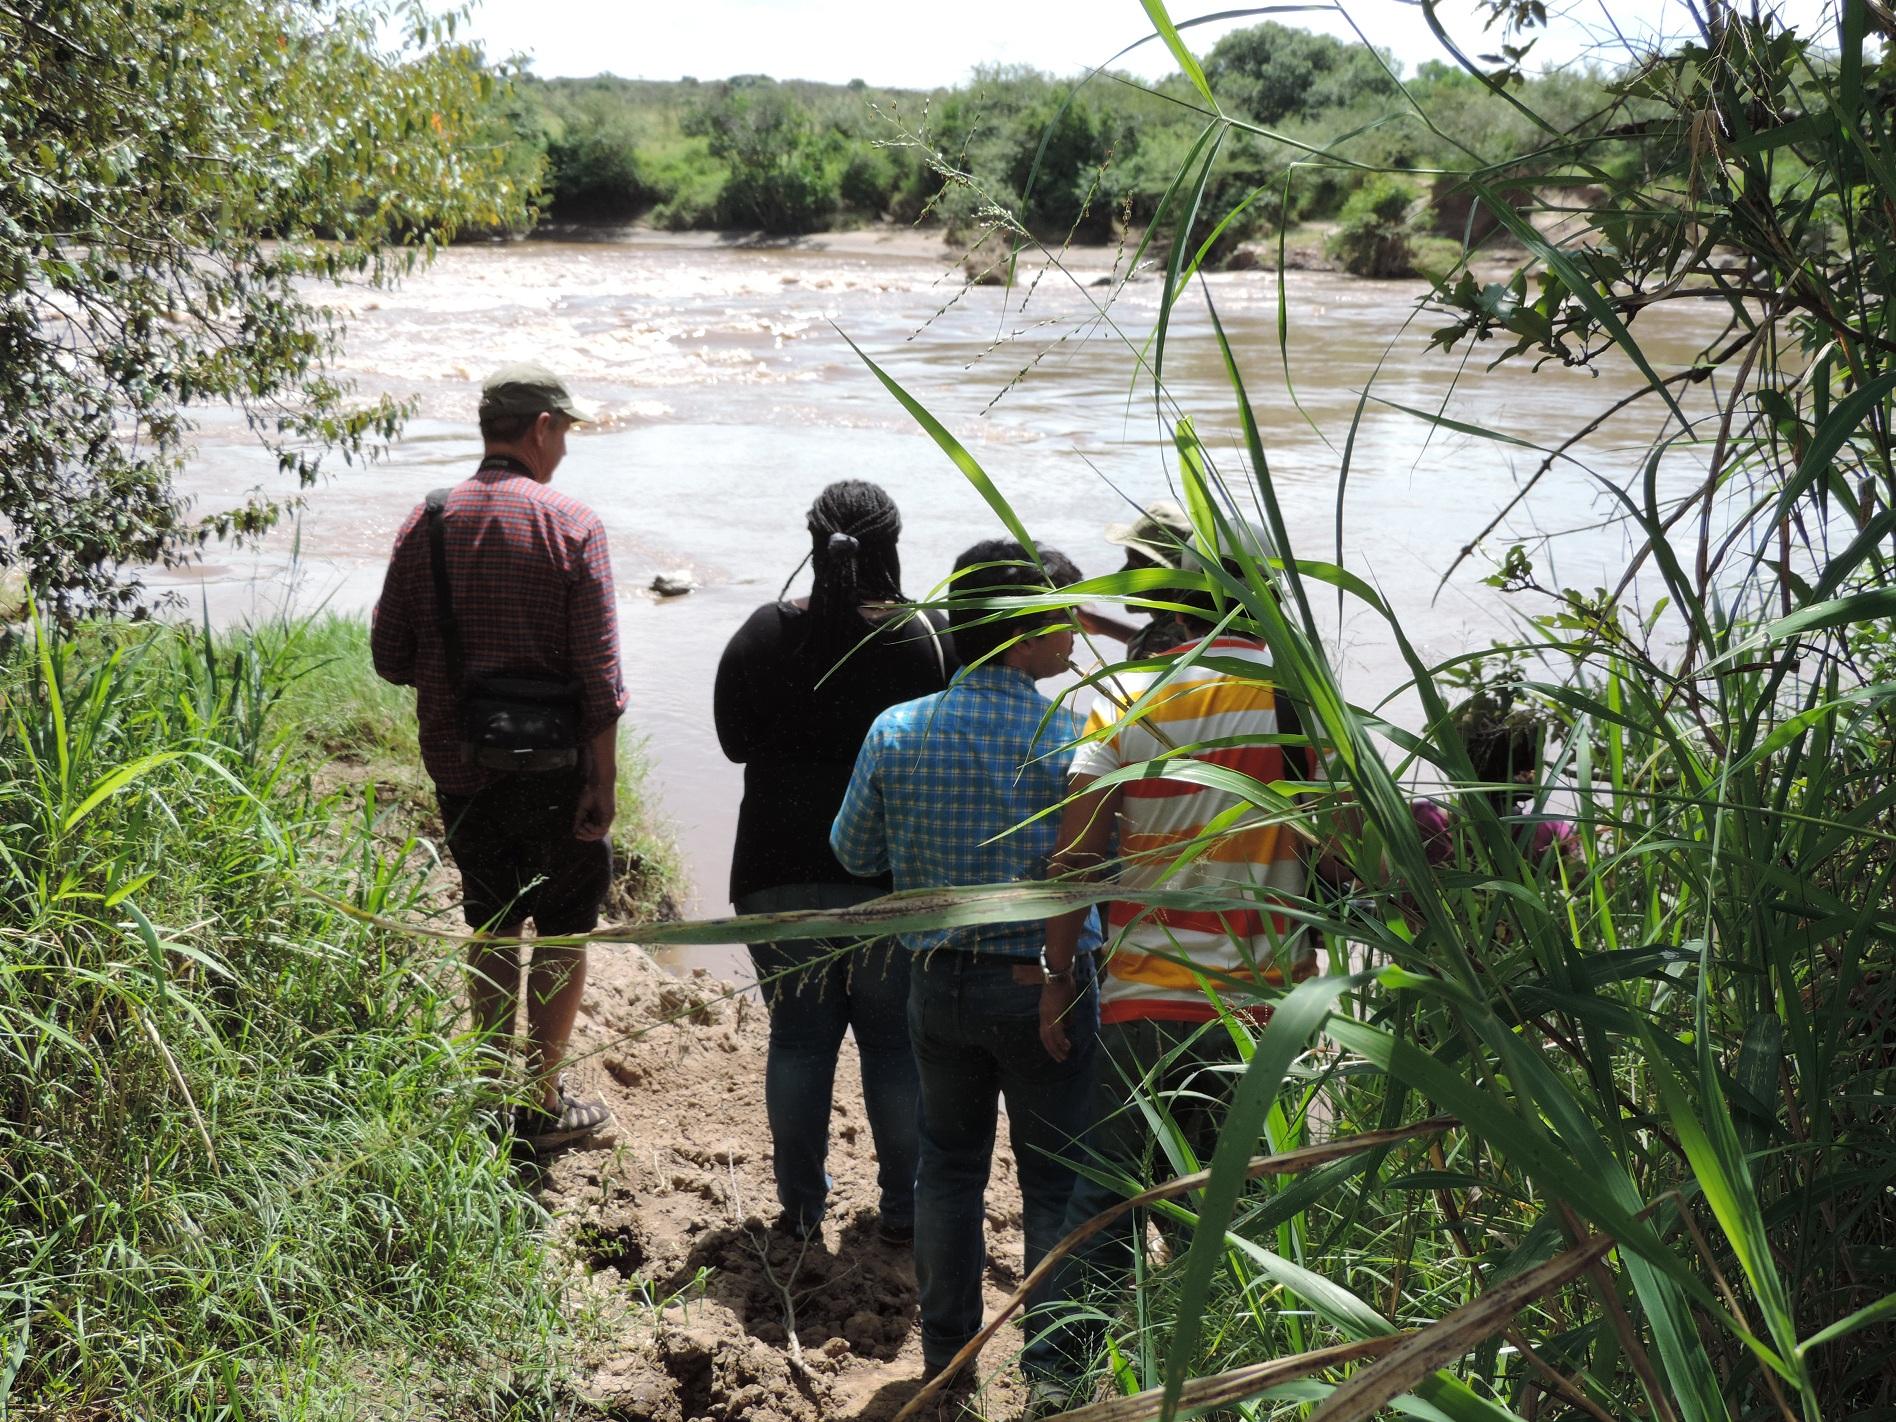 Kenya budget safaris-group joining safaris